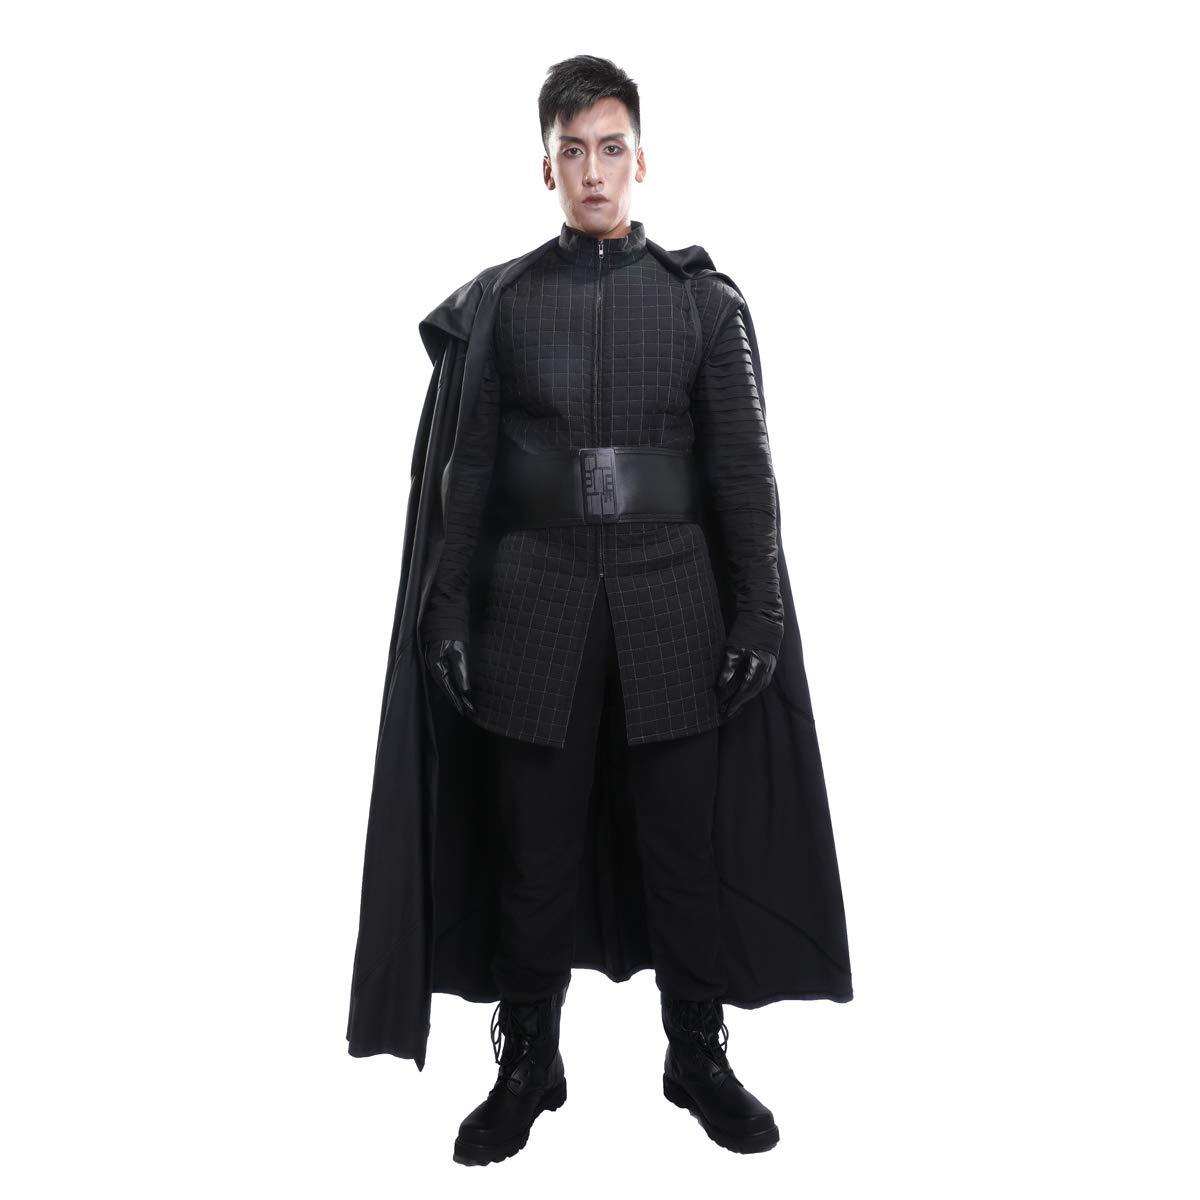 Xcoser disfraz de Ant man sintética cosplay disfraz Kit Traje de ...